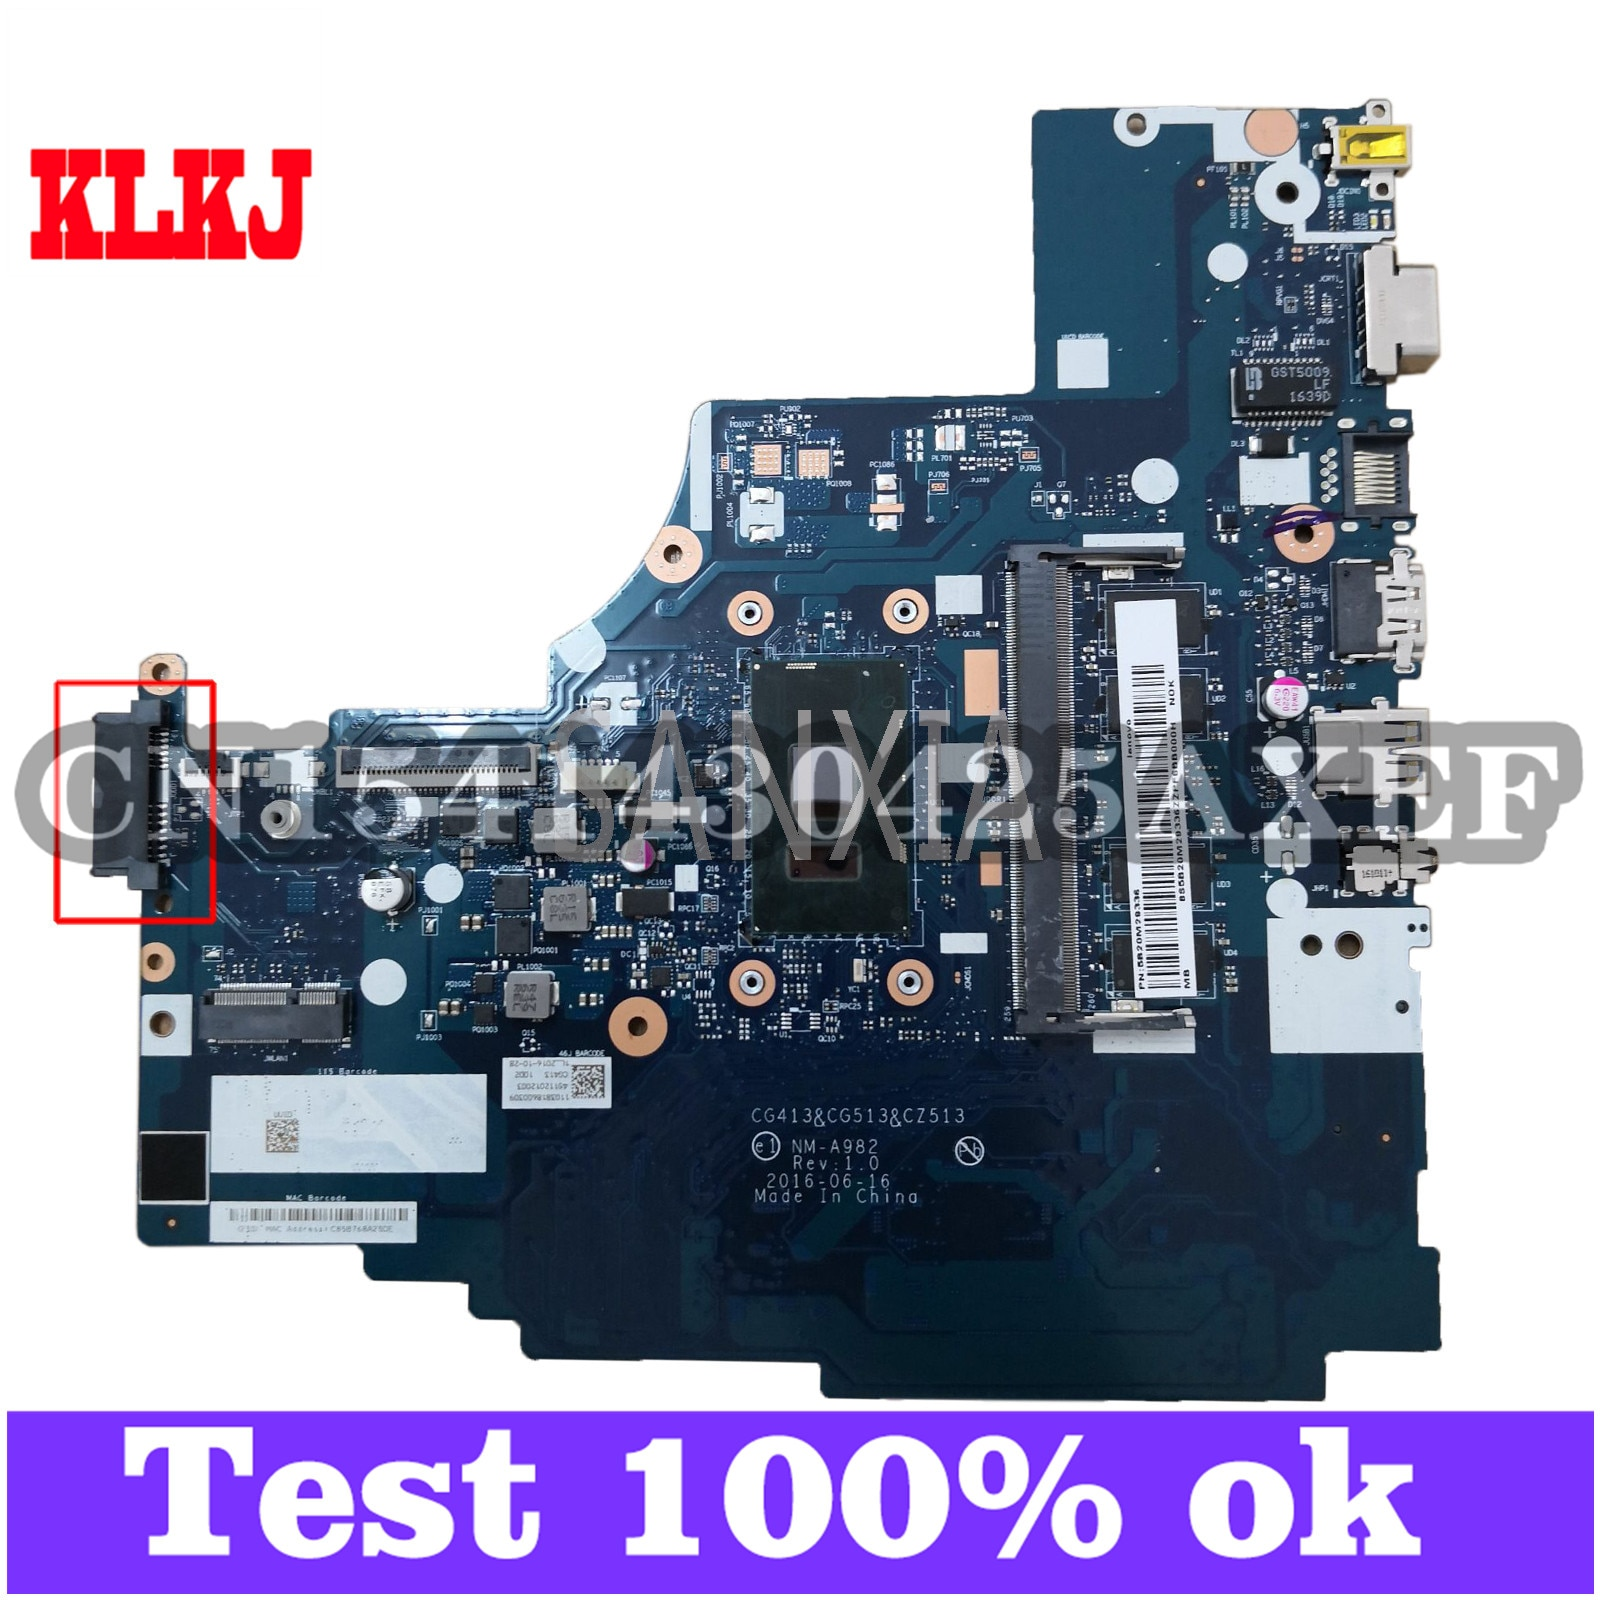 KLKJ NM-A982 اللوحة الأم لأجهزة الكمبيوتر المحمول لينوفو 310-14IKB اللوحة الرئيسية الأصلية 4G-RAM I3-7100U